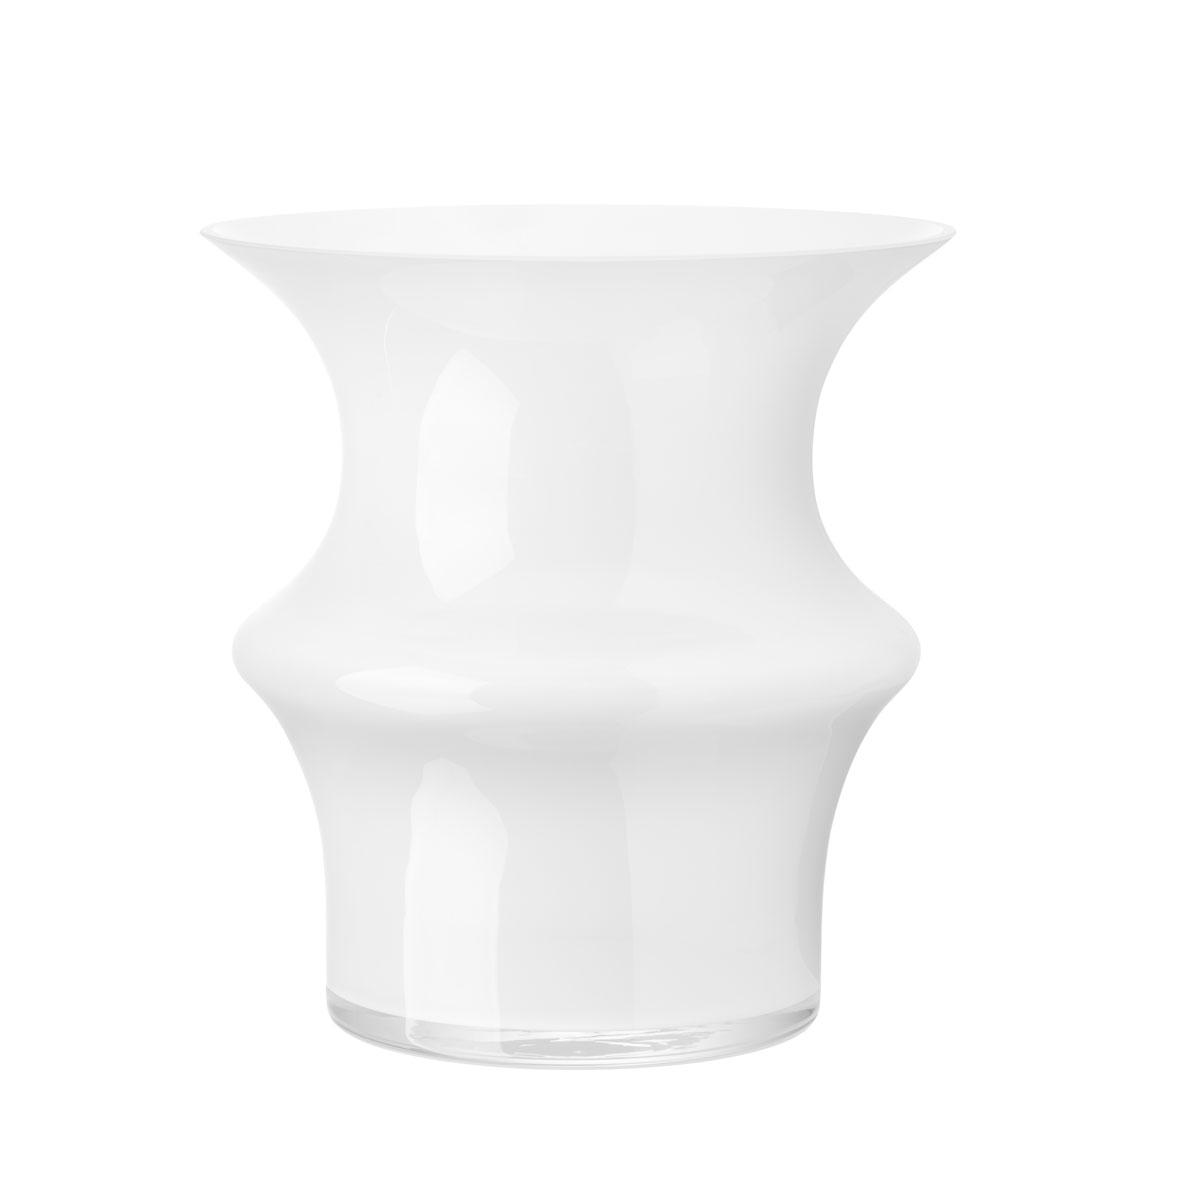 Kosta Boda Pagod Small Vase, Beige